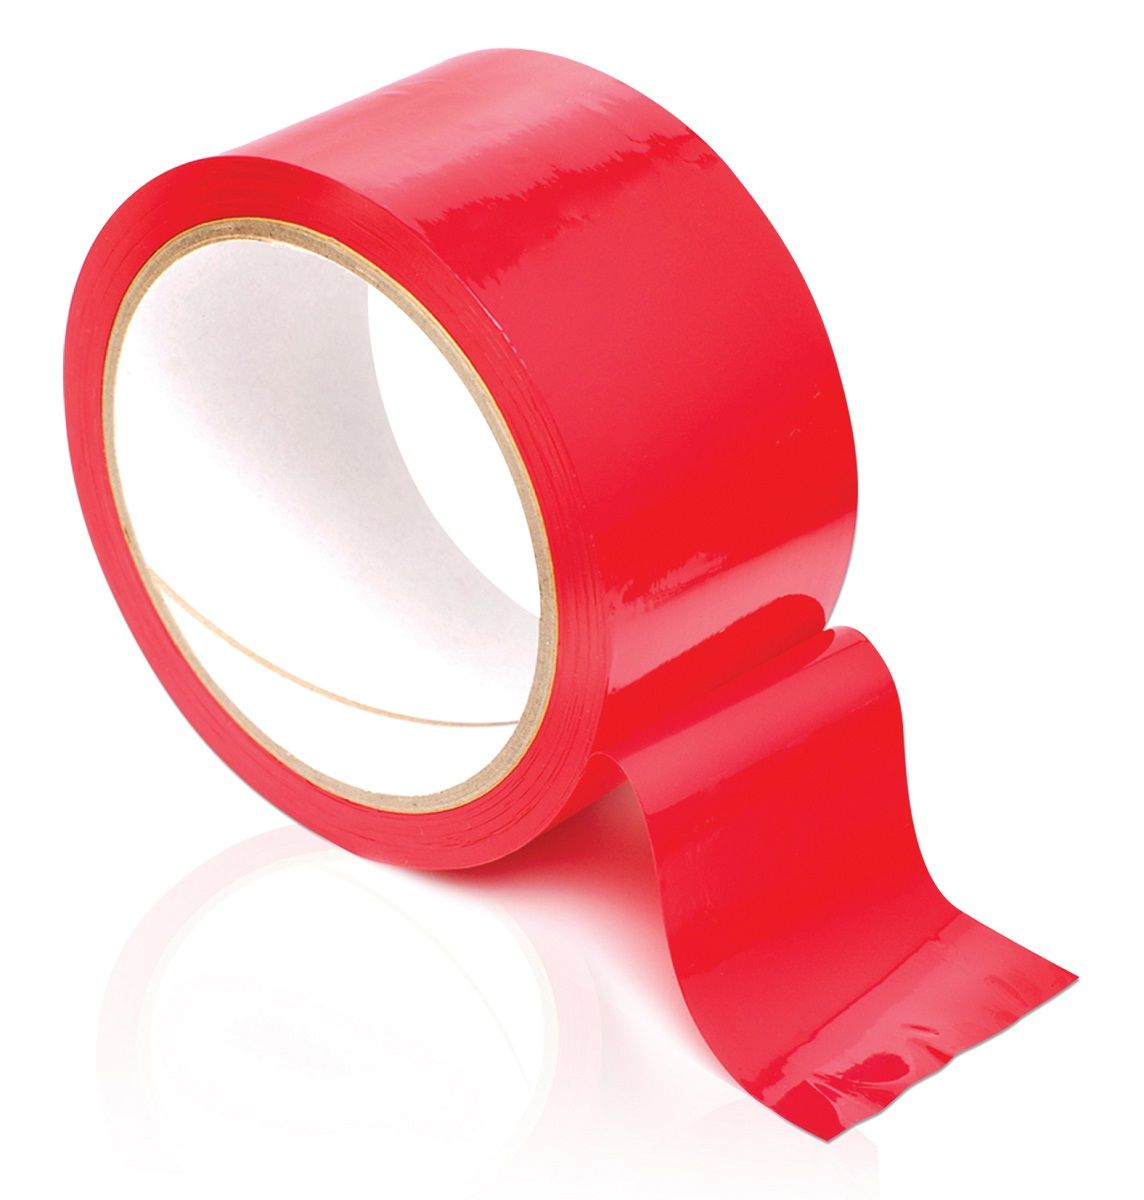 Красная самоклеющаяся лента для связывания Pleasure Tape - 10,7 м. - фото 131625